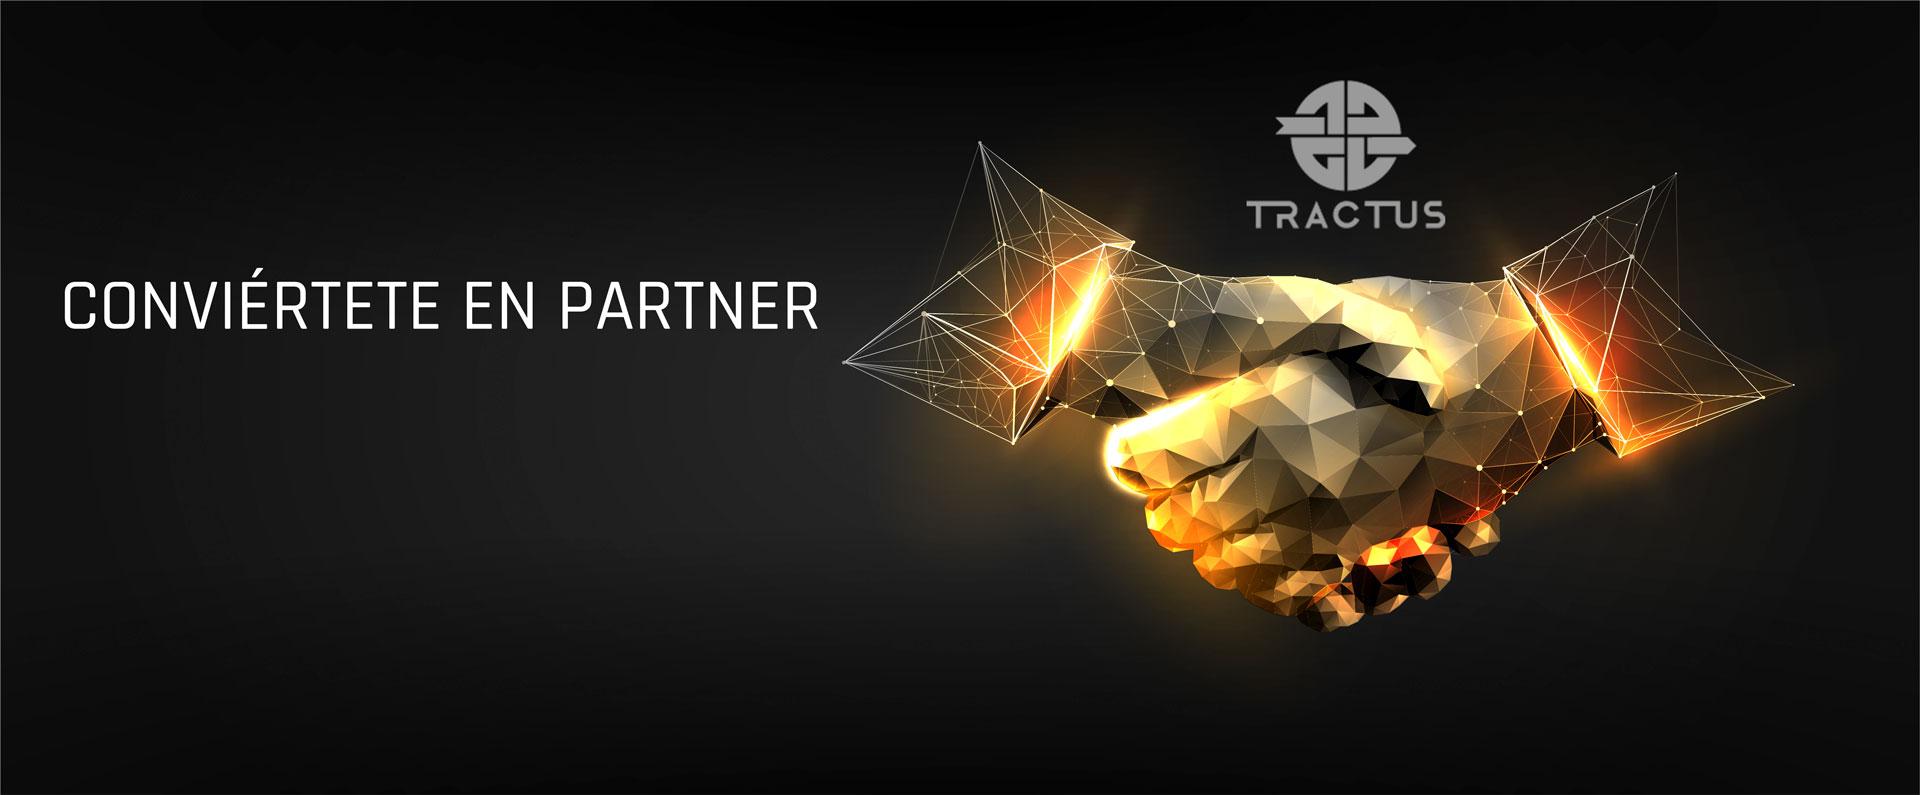 conviertete-en-partner